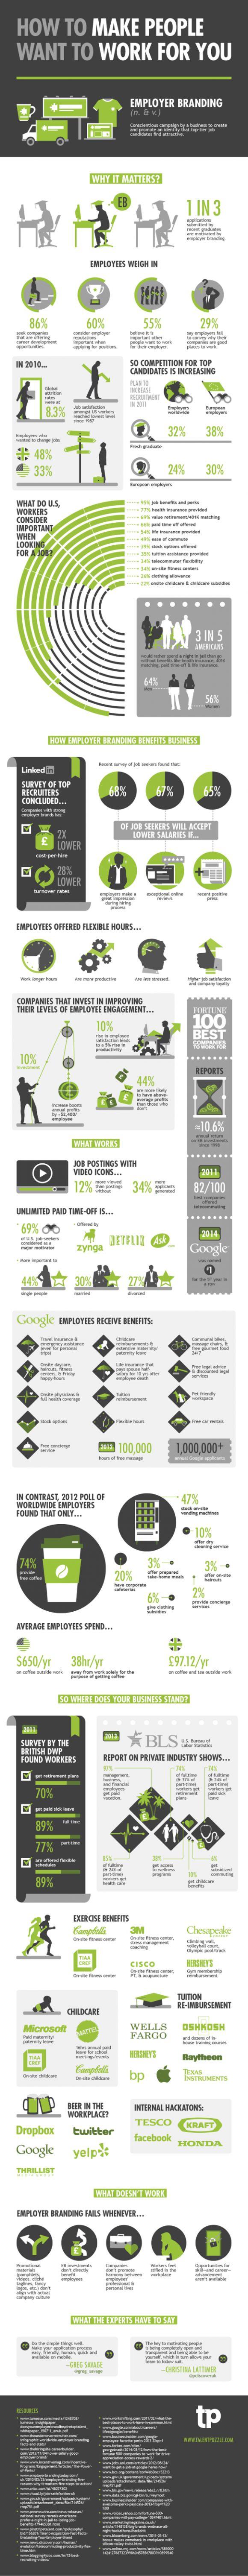 leuke infographic met data #employer branding TalentPuzzle-MakePeopleWorkForYou_600px-Temp-1